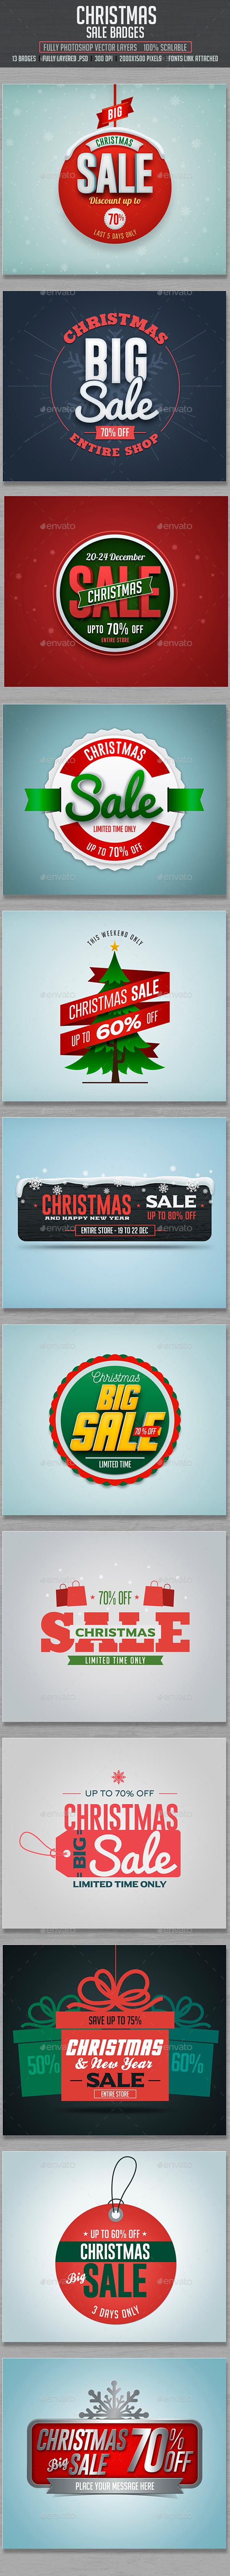 Christmas Sale Badges - Badges & Stickers Web Elements